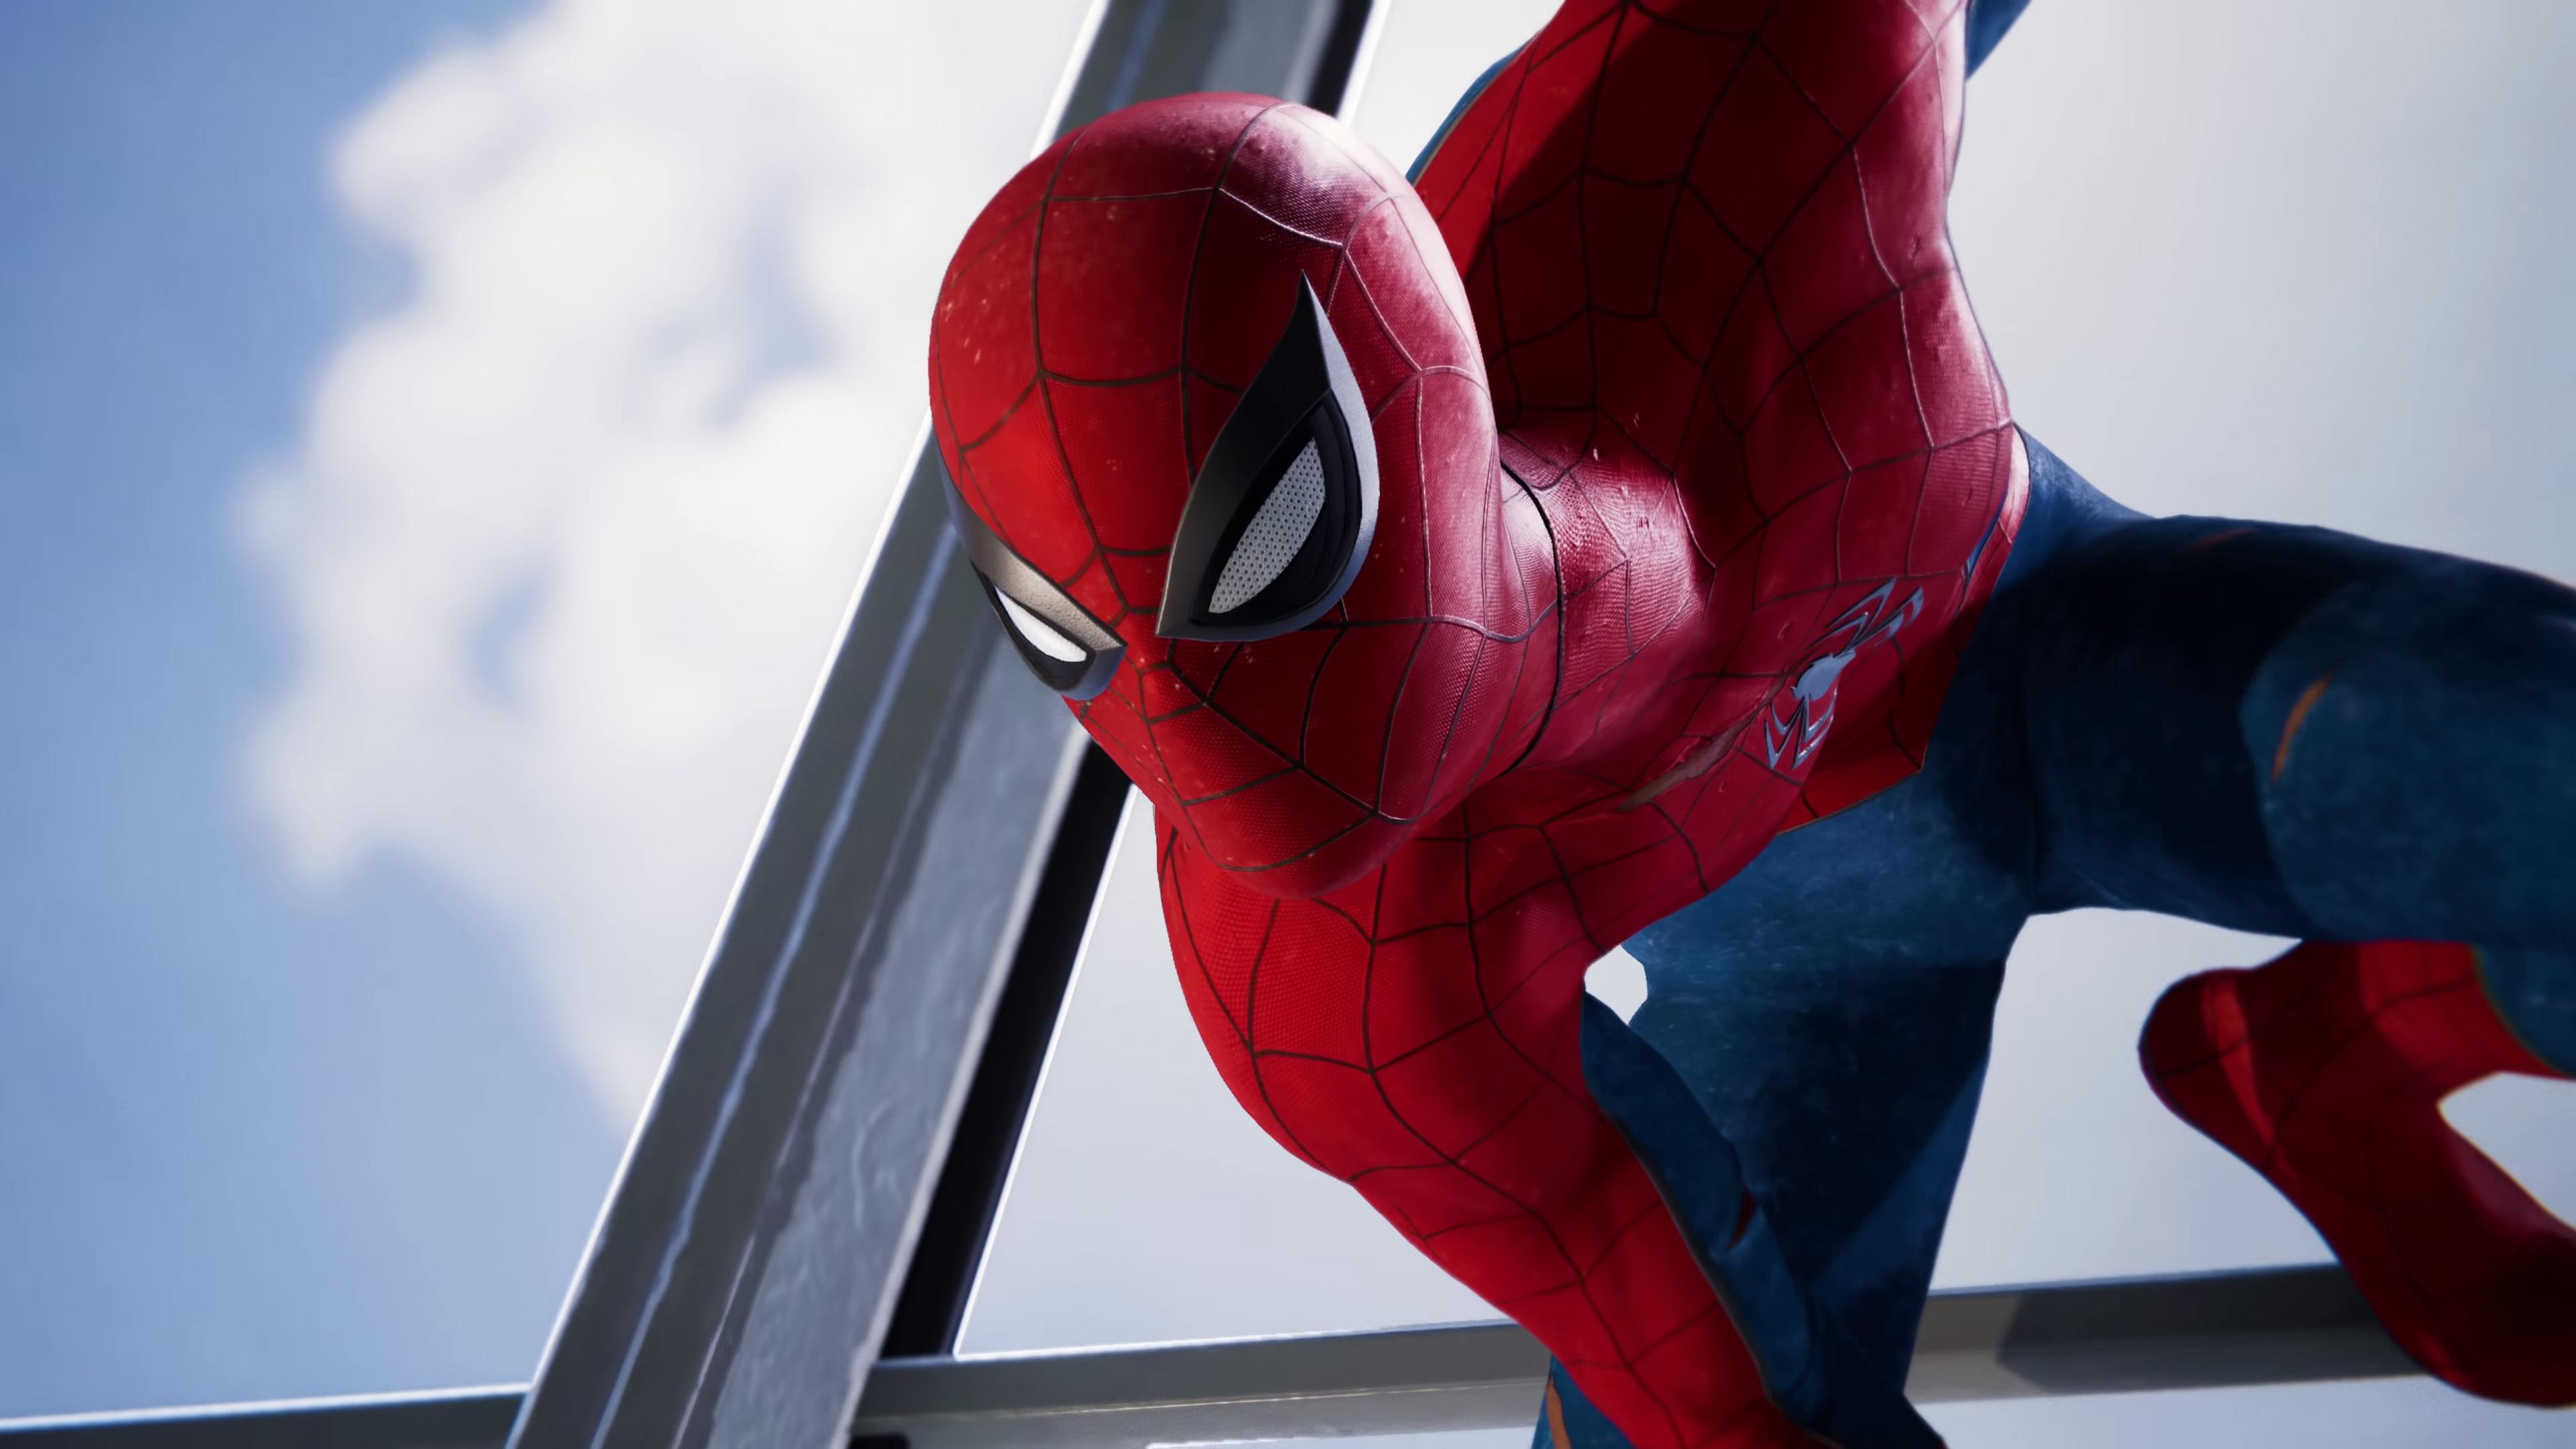 spiderman ps4 2018 4k 1537691425 - Spiderman Ps4 2018 4k - spiderman wallpapers, spiderman ps4 wallpapers, ps games wallpapers, hd-wallpapers, games wallpapers, 4k-wallpapers, 2018 games wallpapers